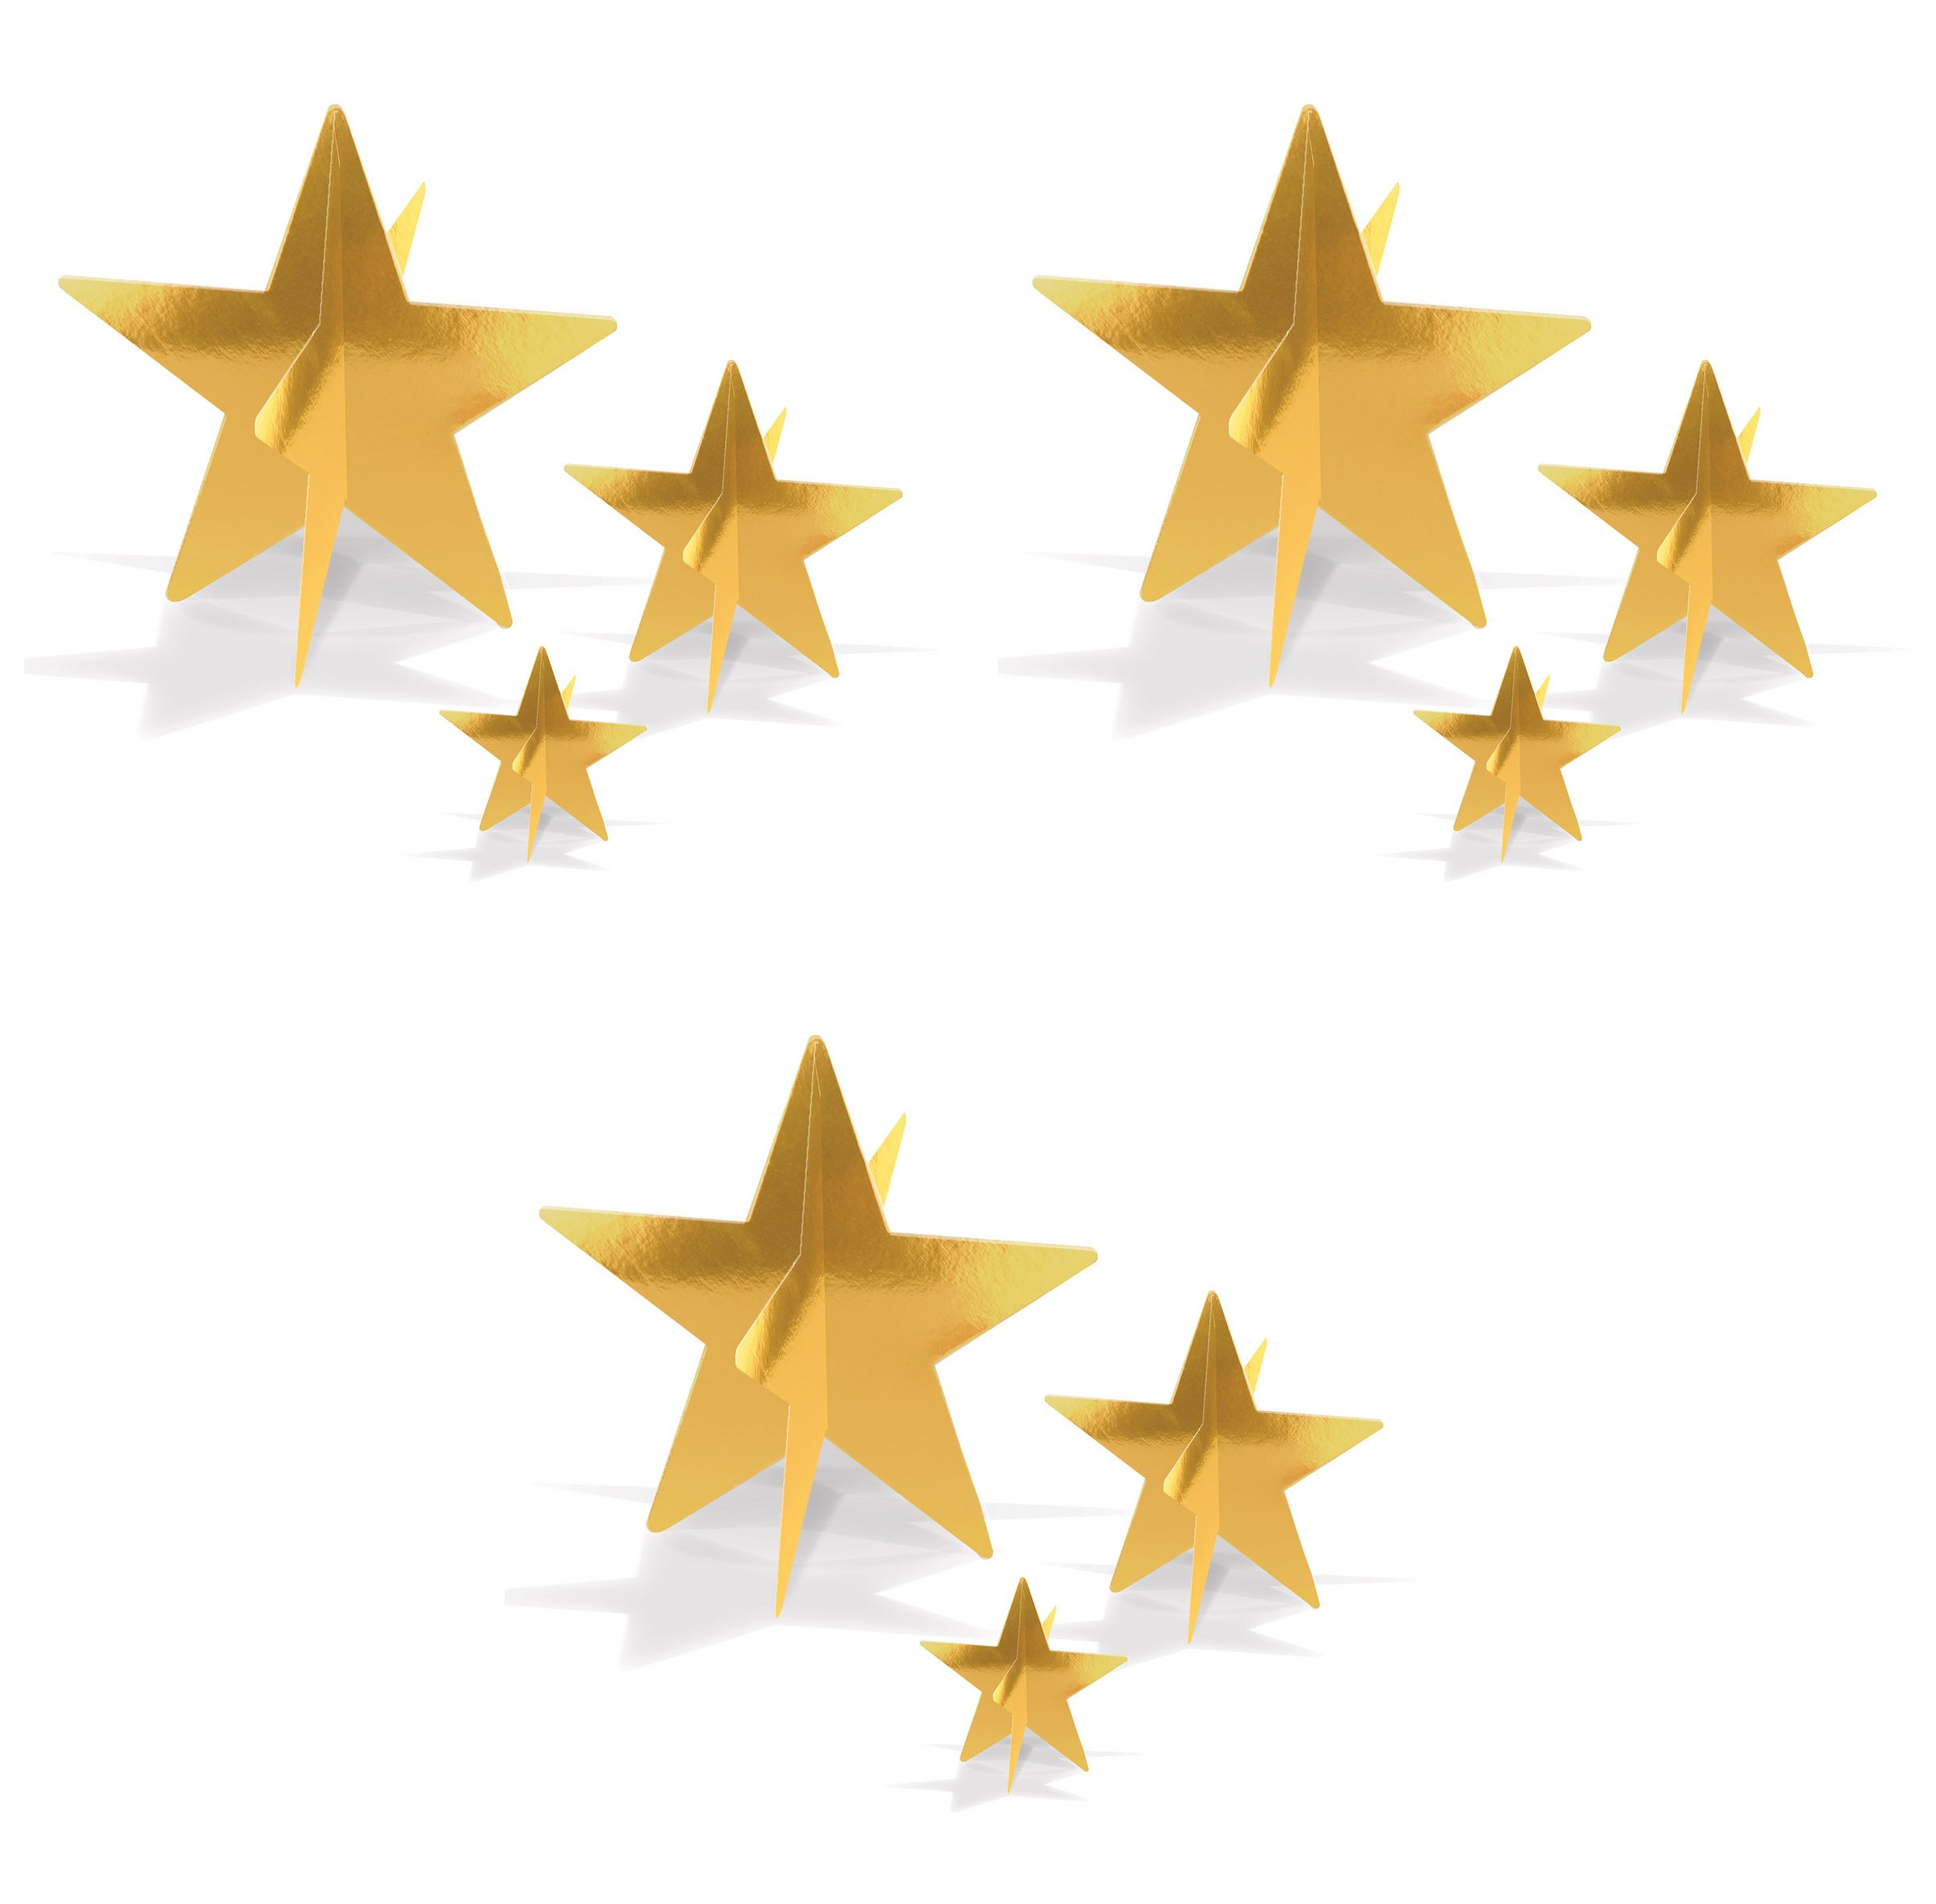 Beistle 52148-GD, 9 Piece 3-D Foil Star Centerpieces, 3'' - 8'' (Gold)